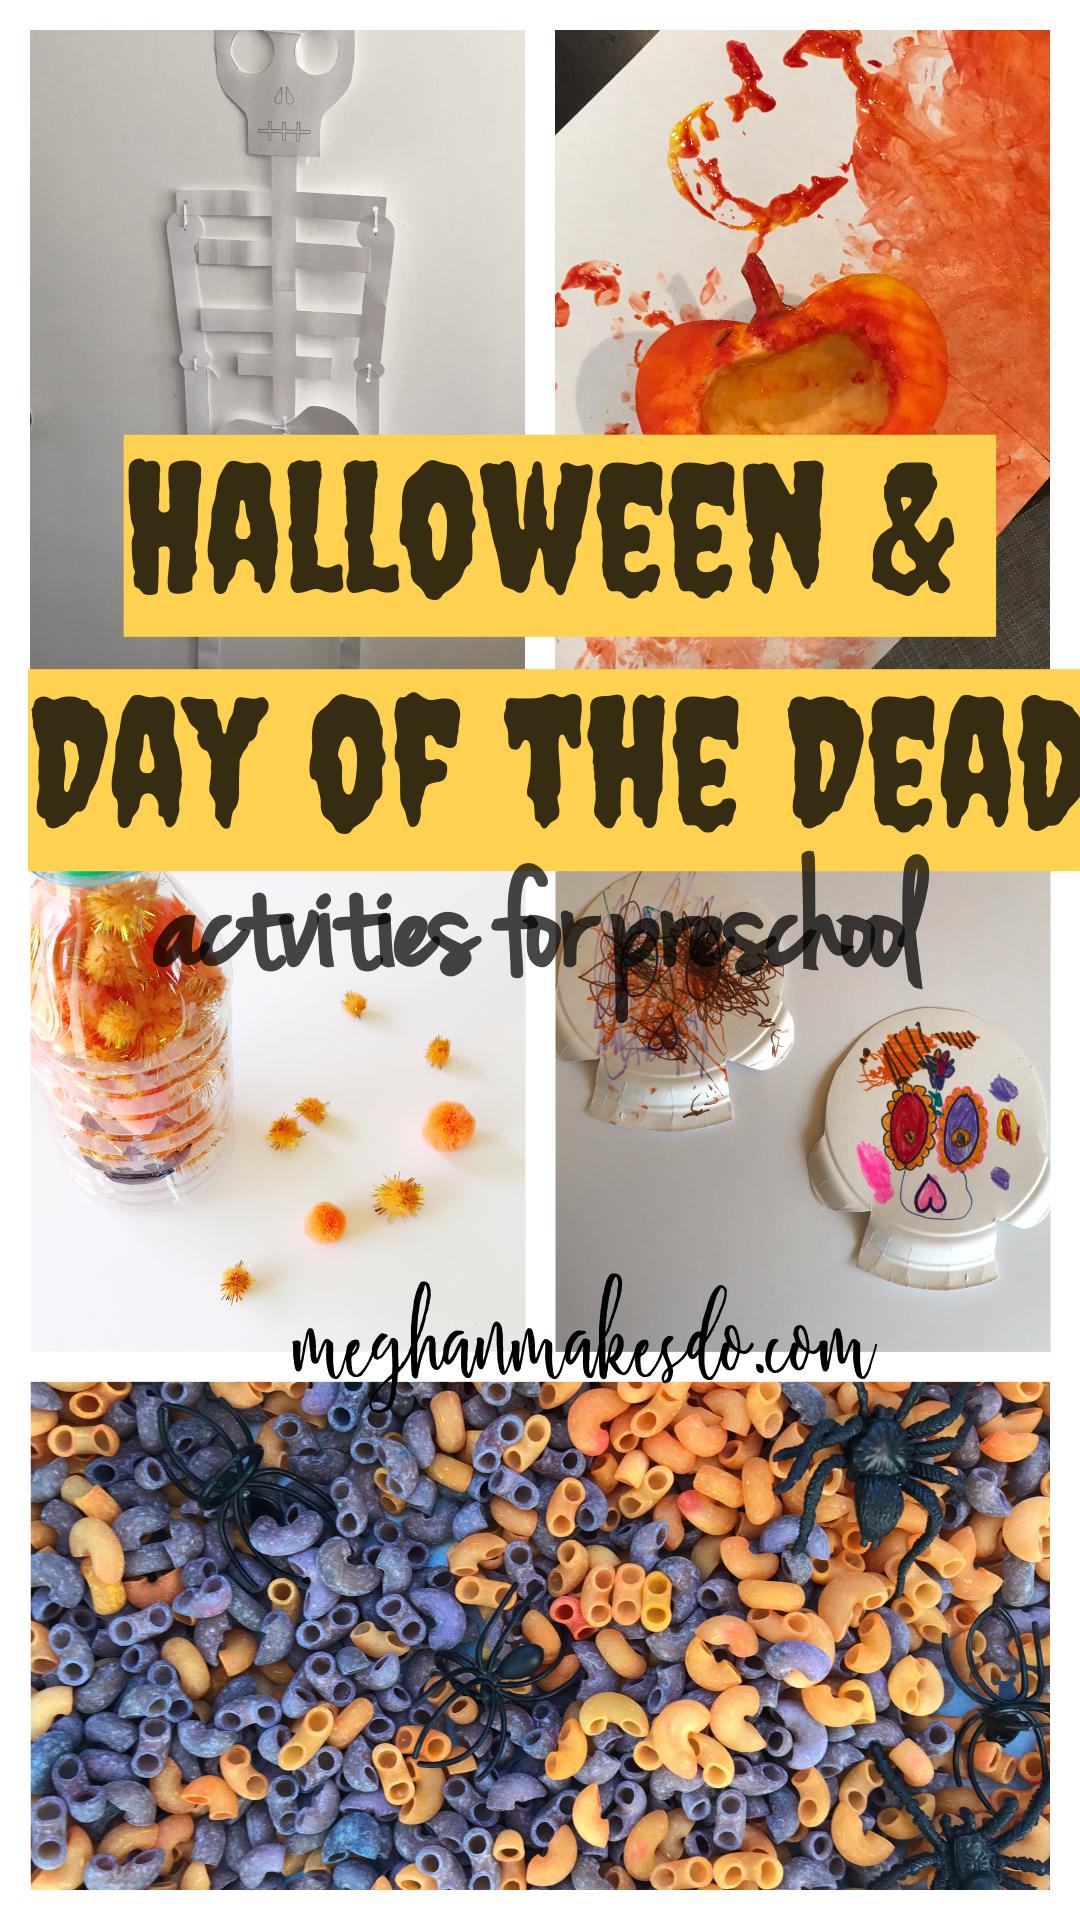 Halloween Day of the Dead.jpg